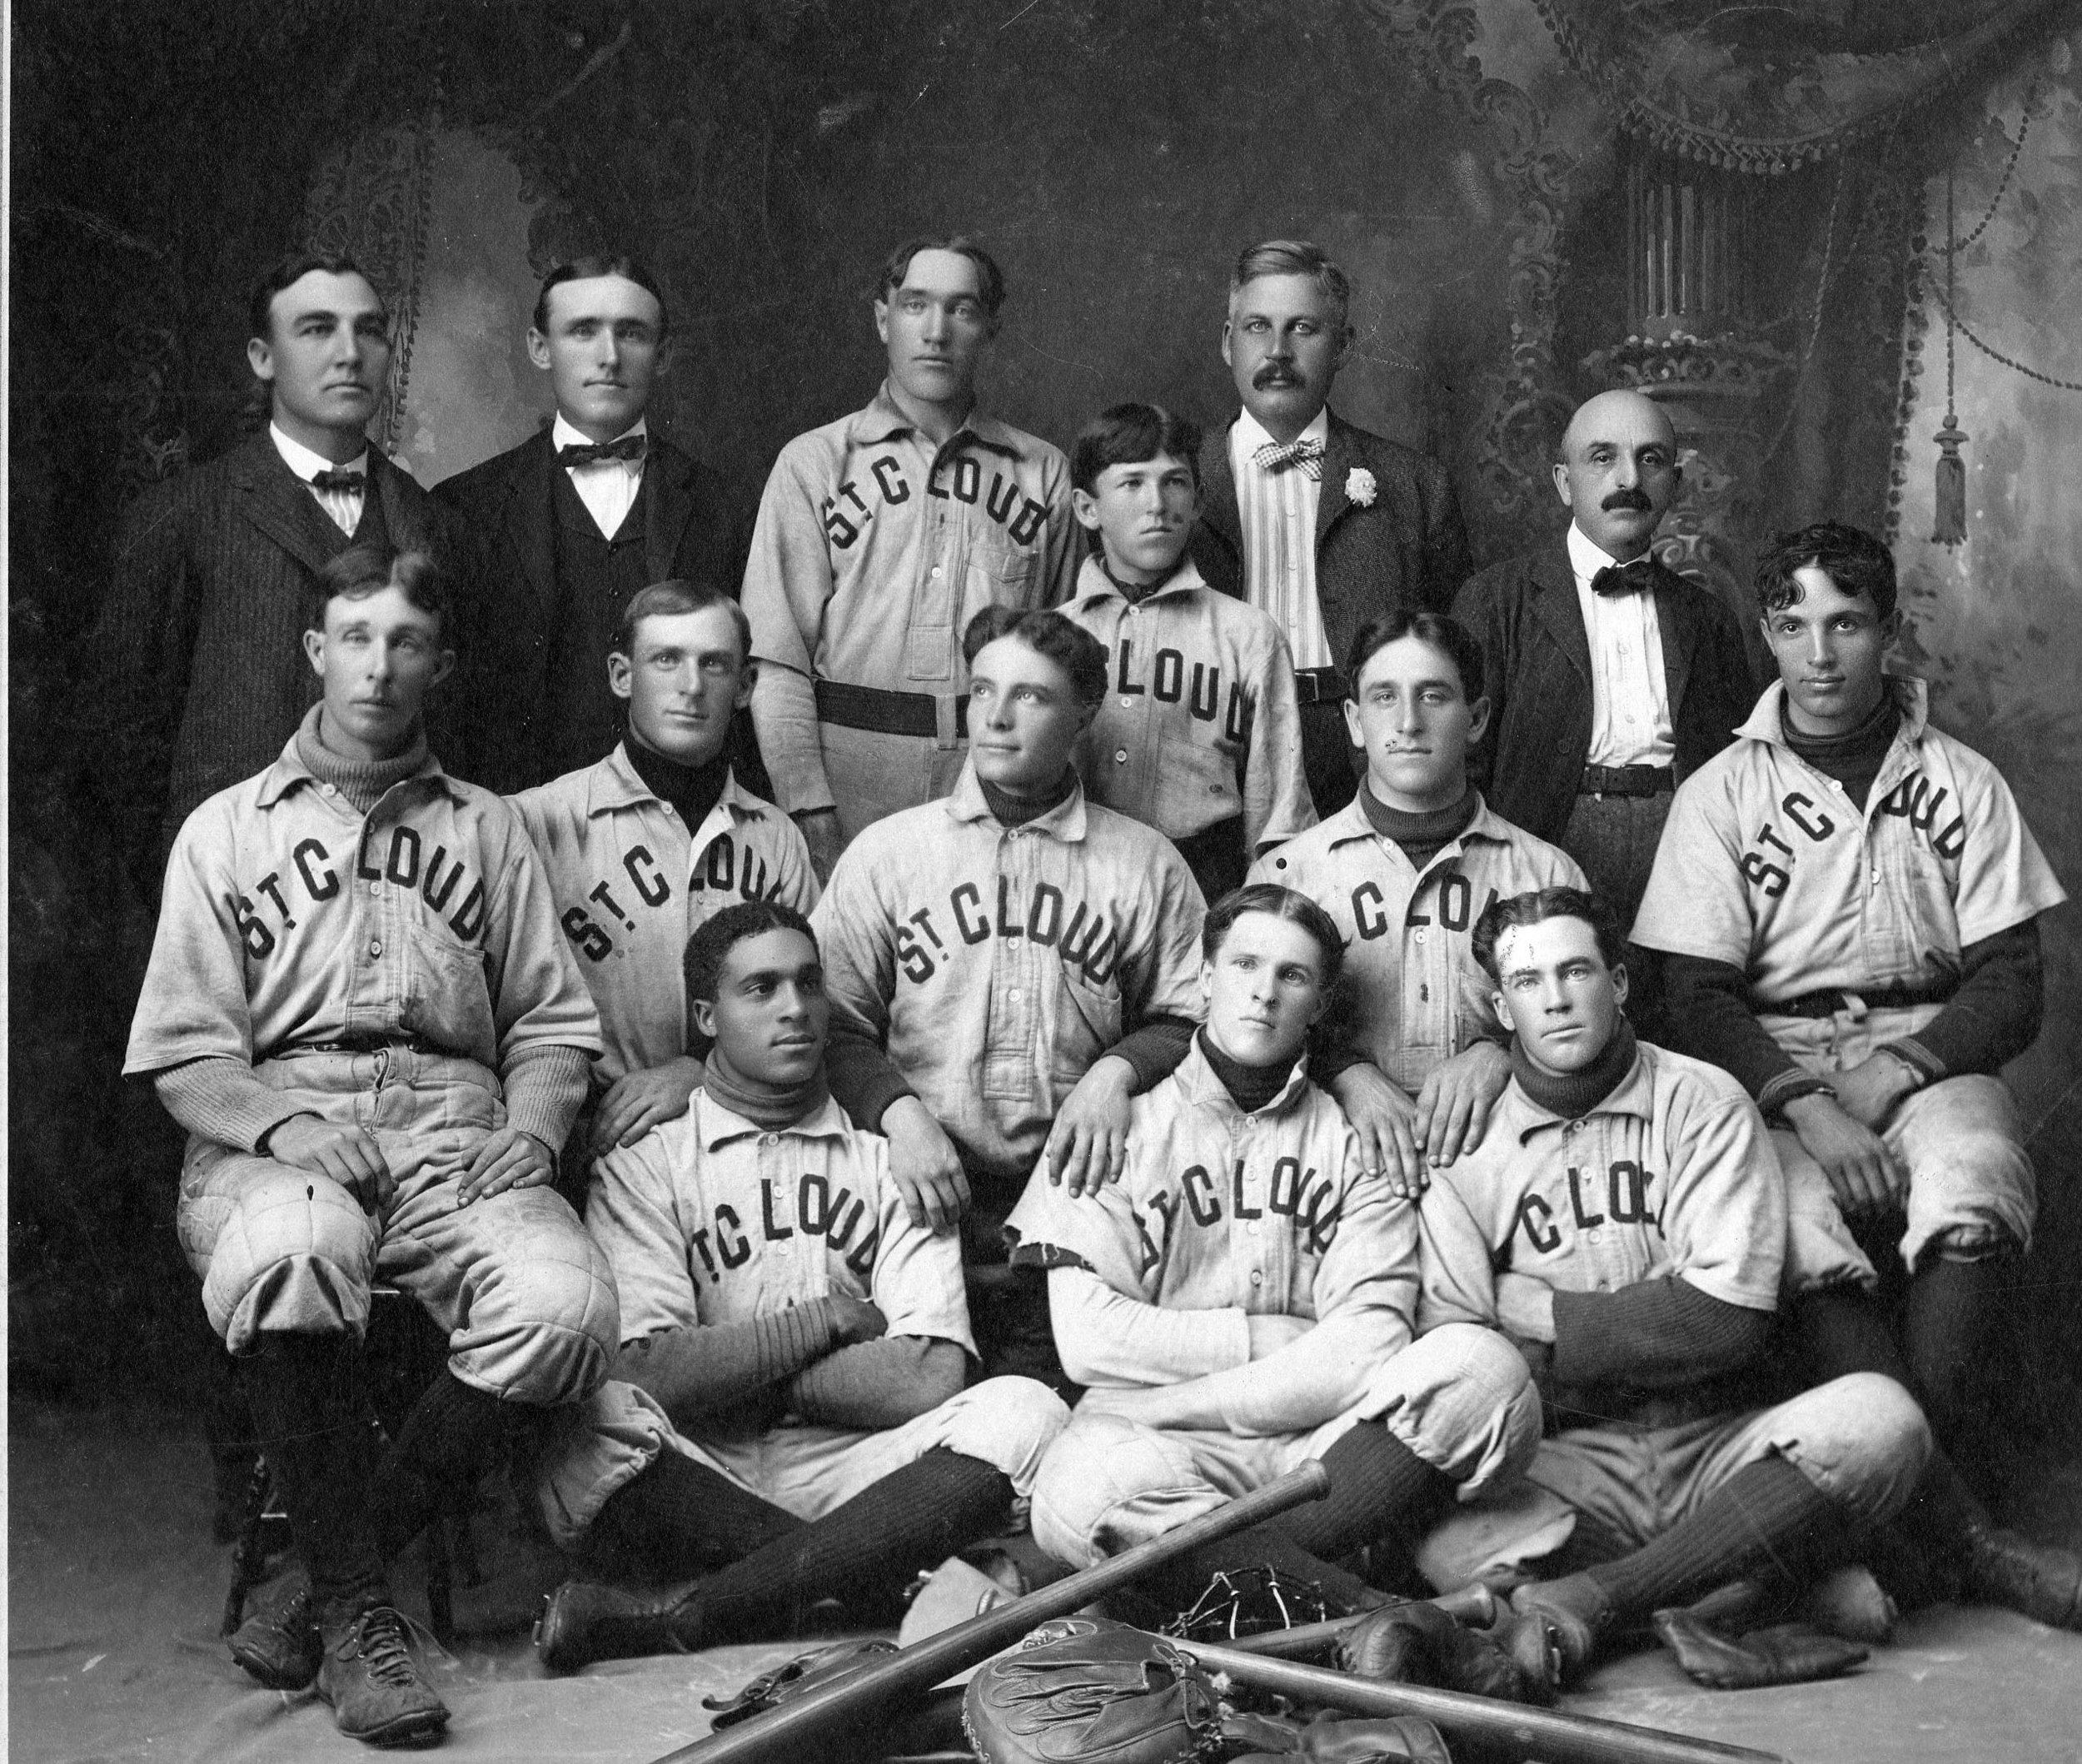 A7680 St Cloud Baseball team 1902 with Walter Ball.jpg